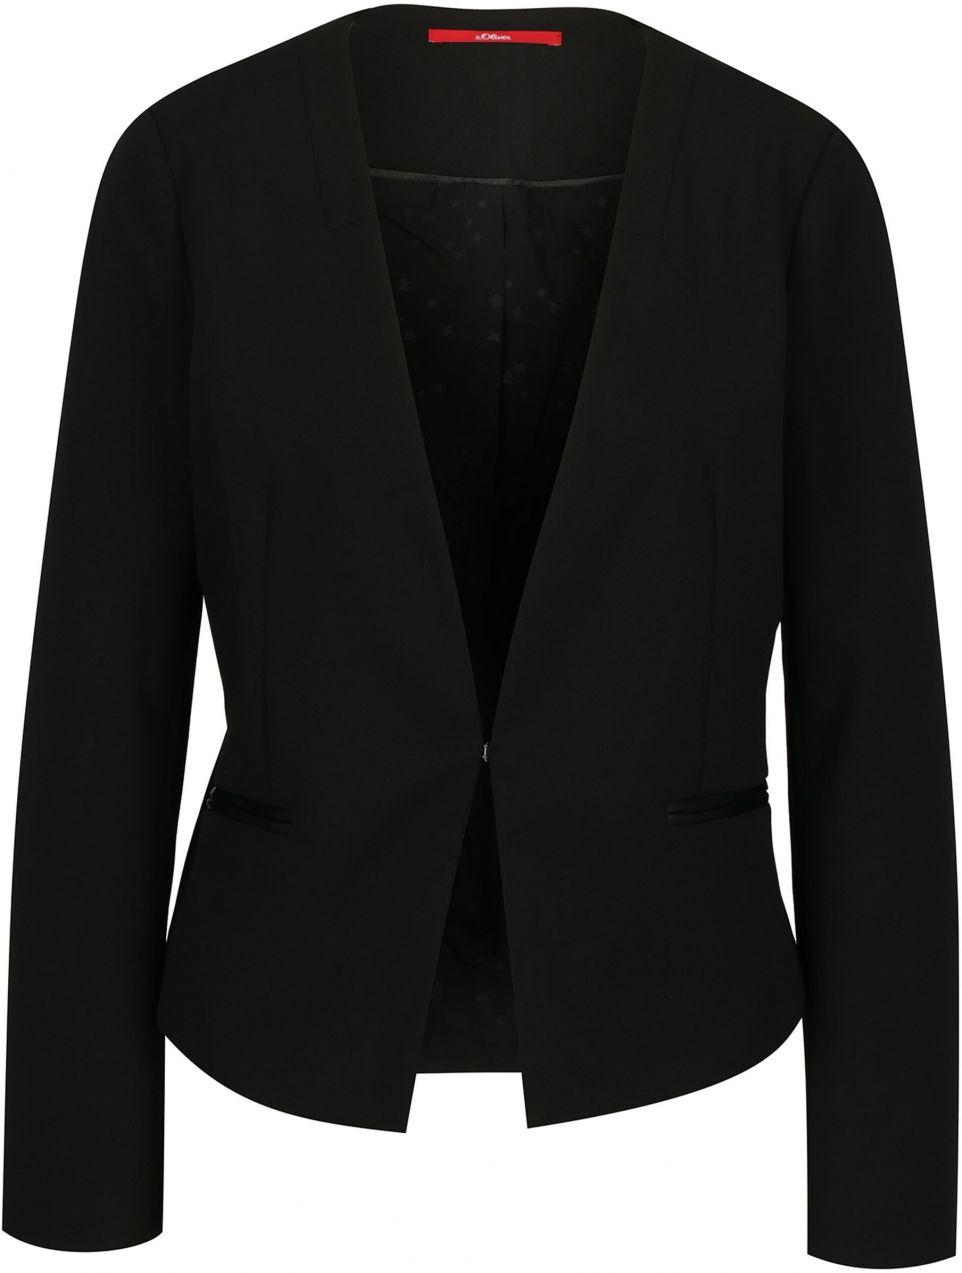 a60c70a135 Čierne dámske sako s.Oliver značky s.Oliver - Lovely.sk